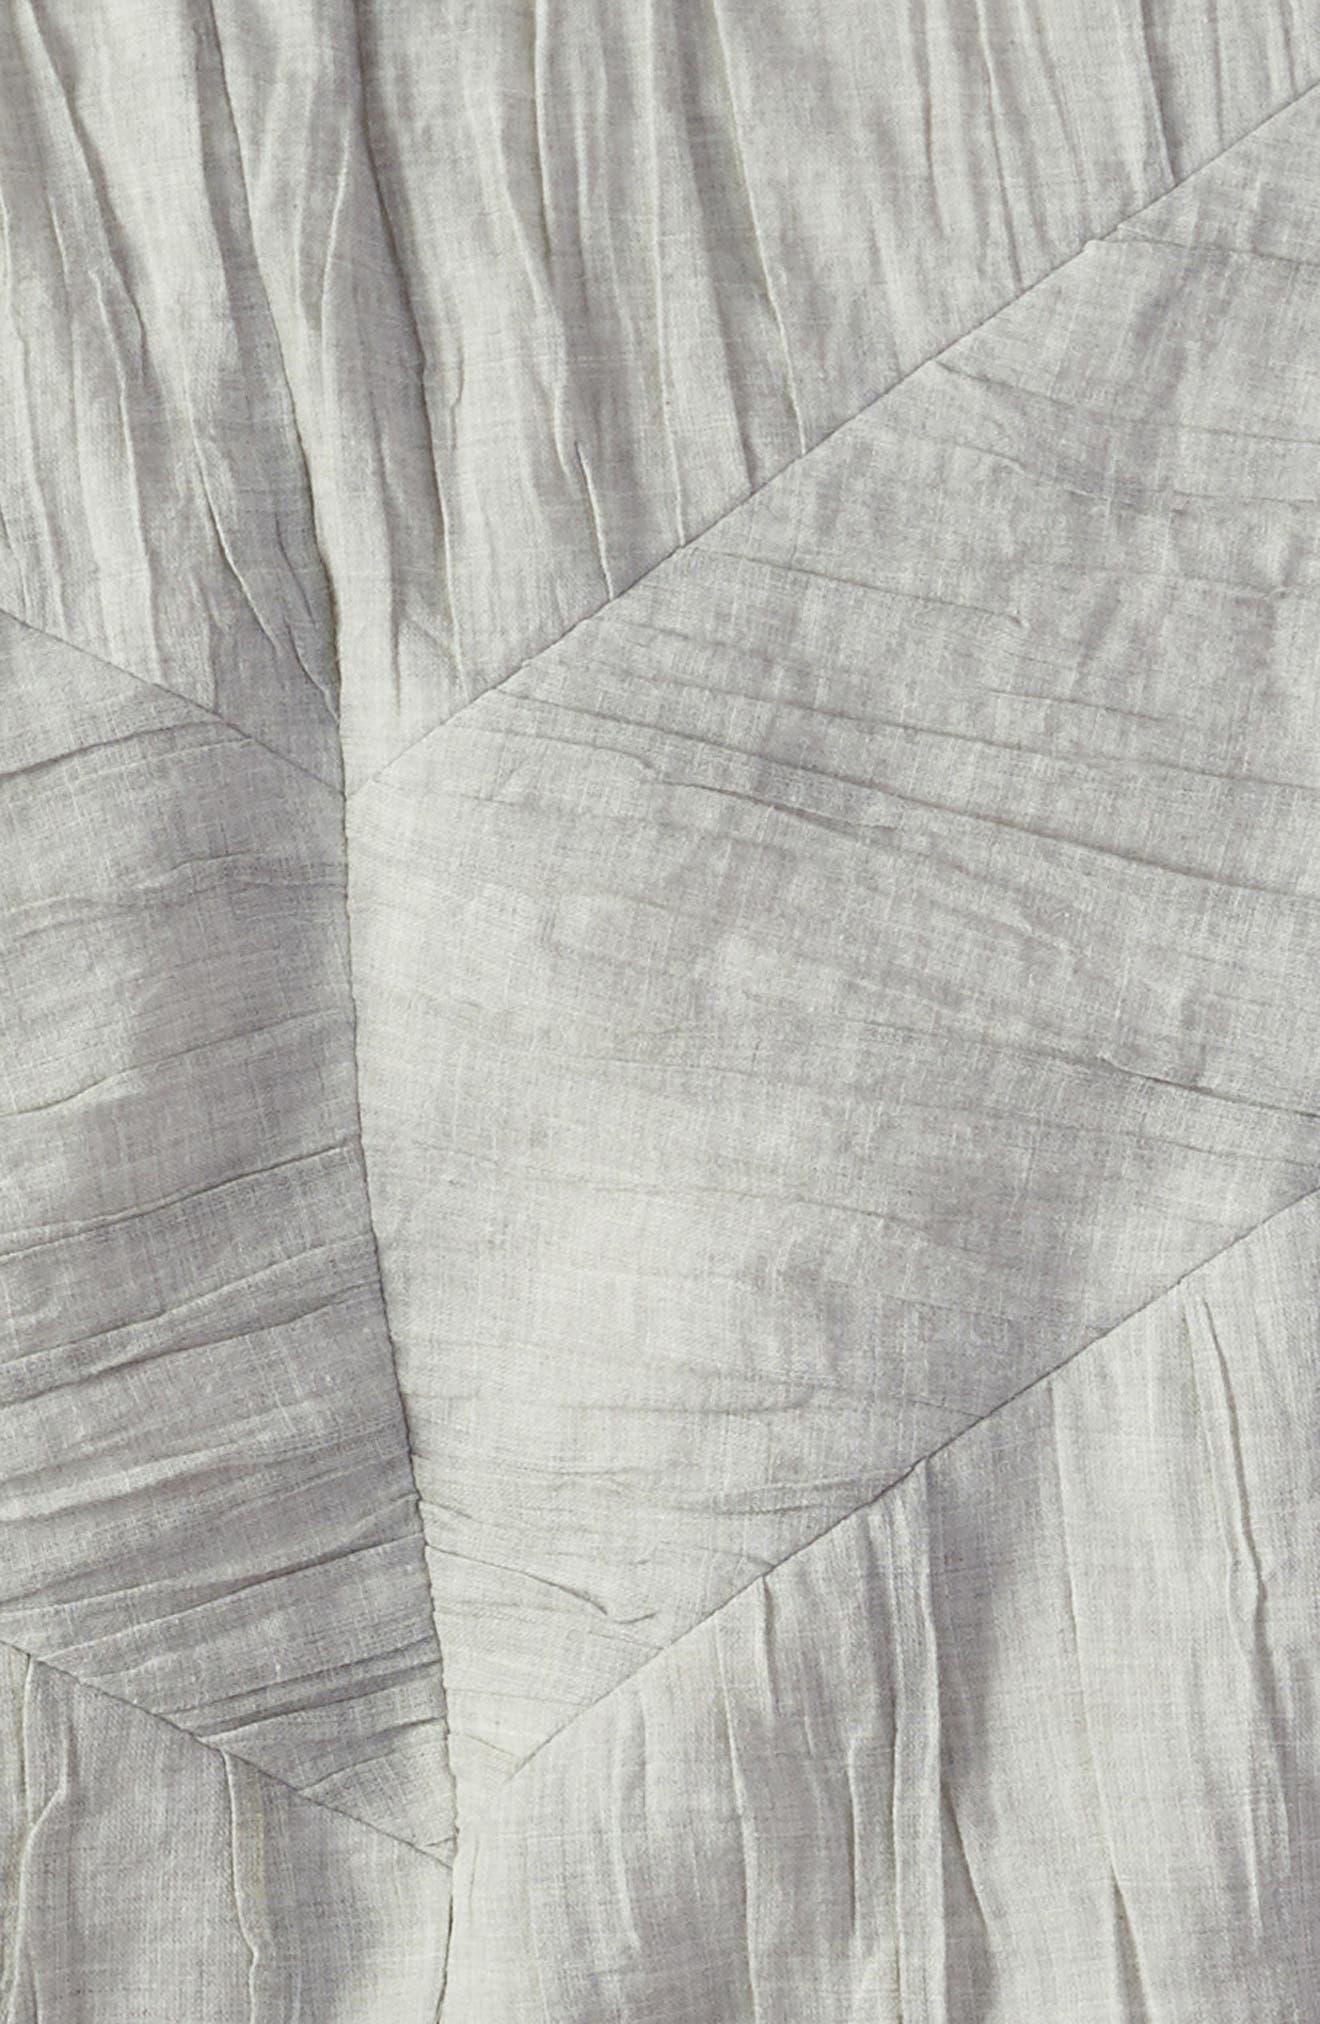 Selene Heathered Duvet Cover,                             Alternate thumbnail 2, color,                             GREY OPAL HEATHER